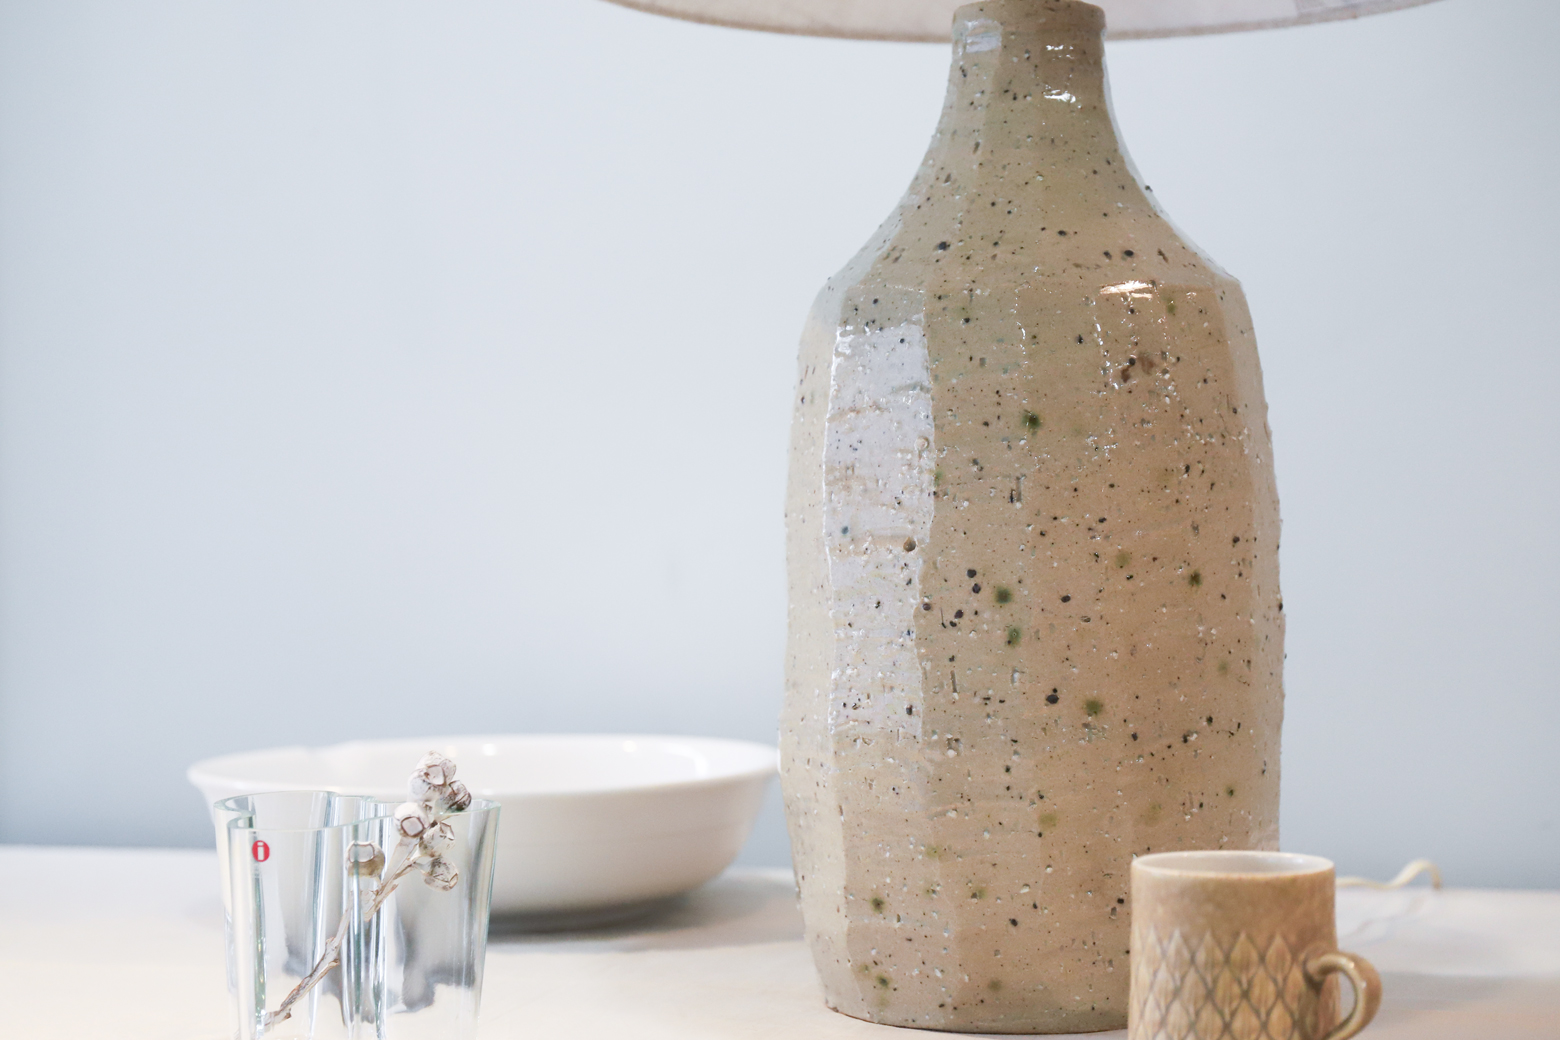 Nunobiki-Yaki pottery Table Lamp / モダン テーブルスタンドランプ 陶器 ヴィンテージ 布引